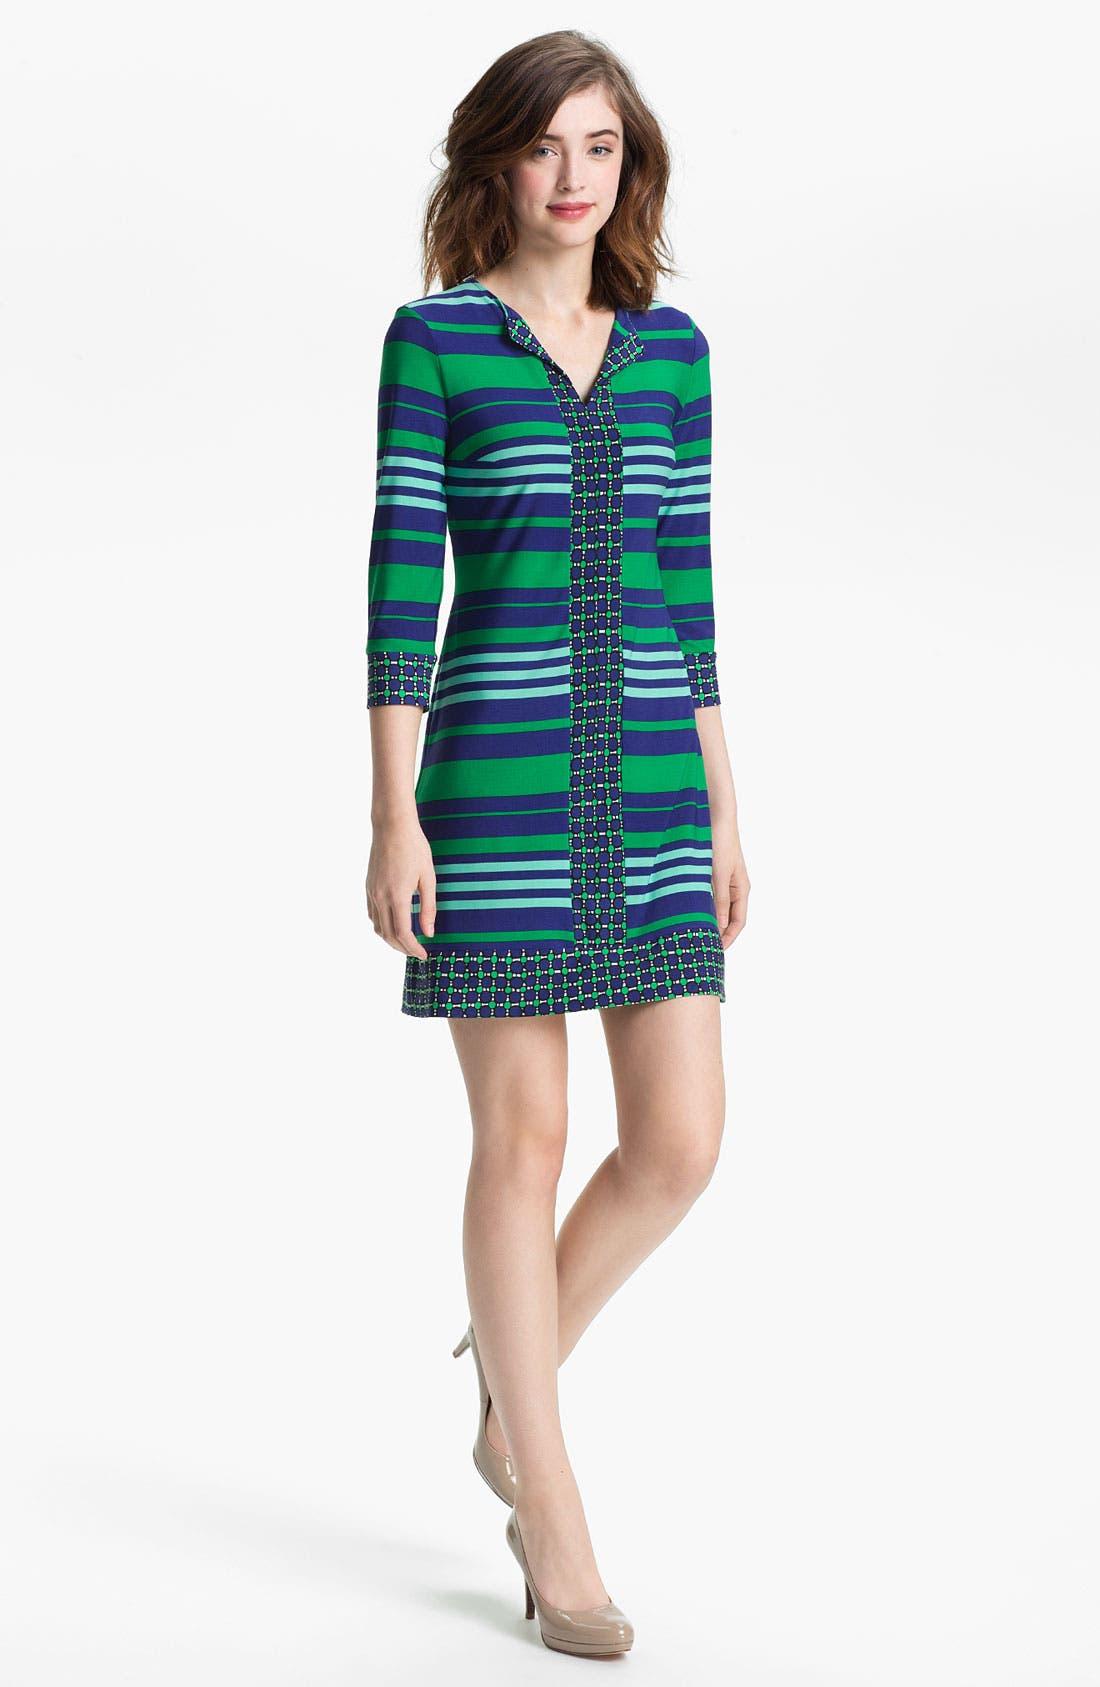 Alternate Image 1 Selected - Donna Morgan Contrast Print & Stripe Sheath Dress